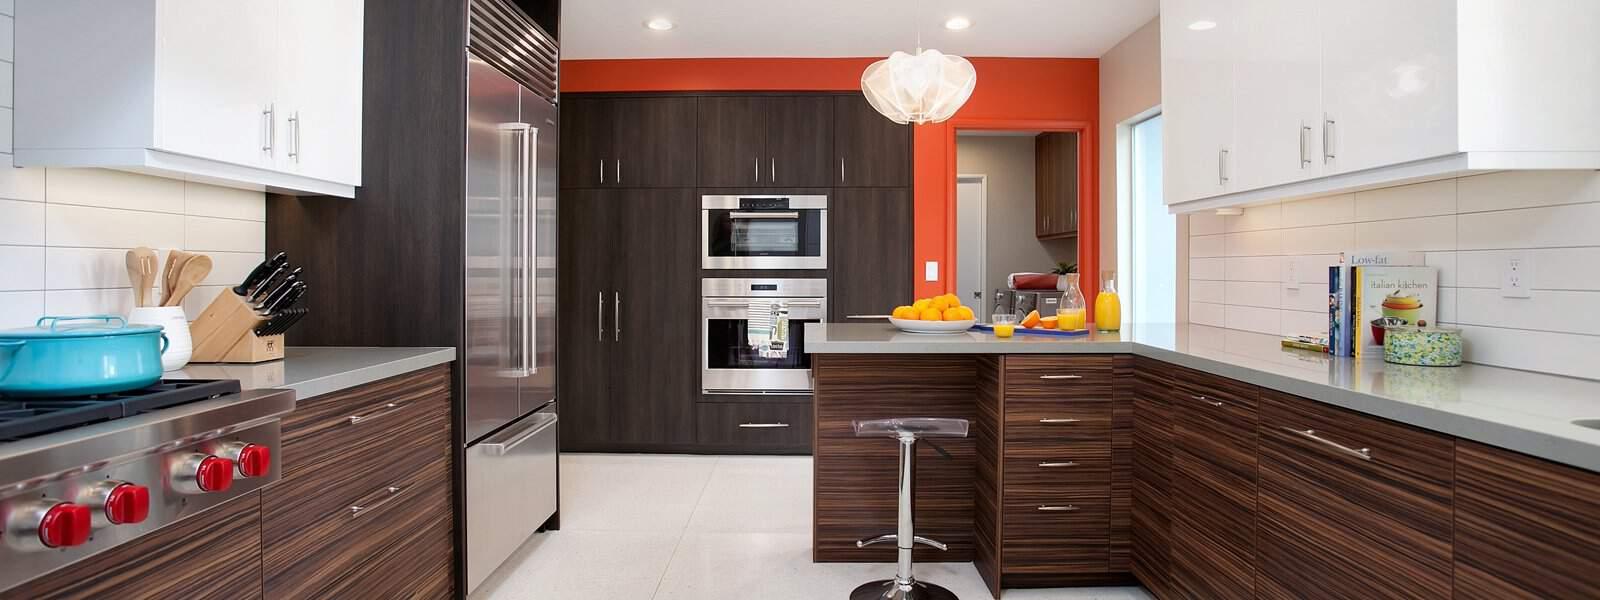 Custom Cabinets in San Diego - Jackson Design & Remodeling